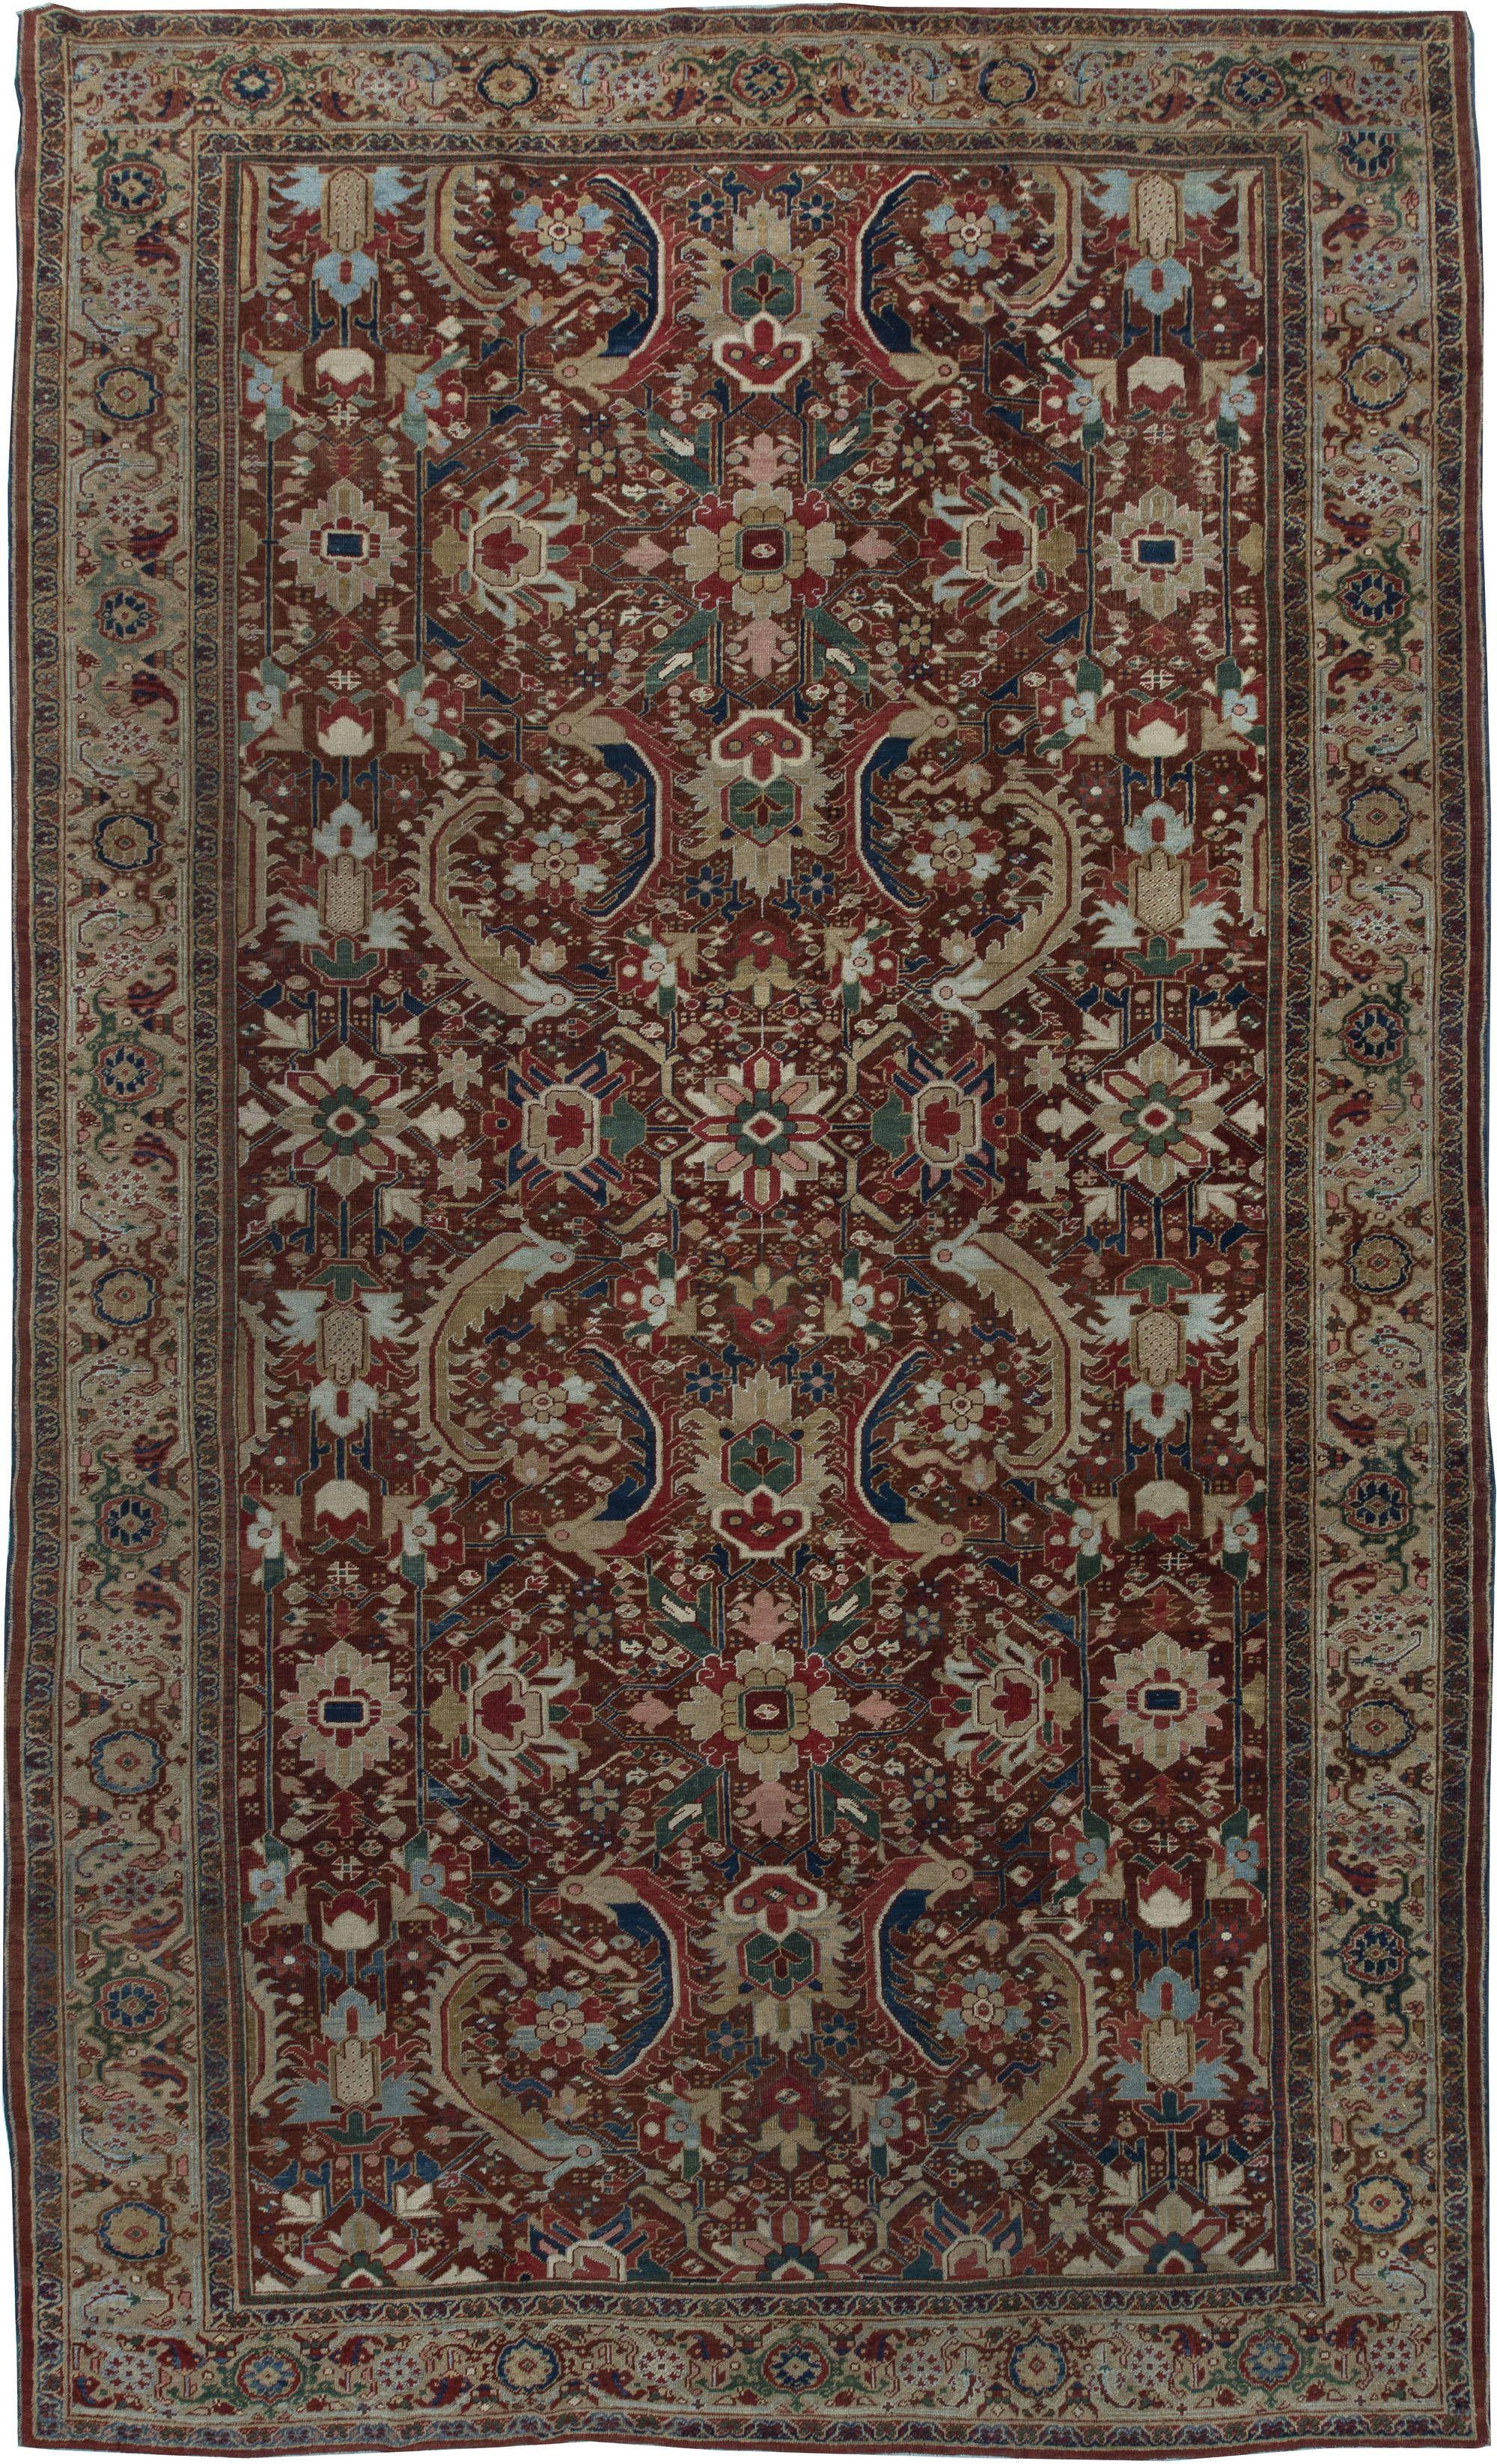 Persian Heriz Carpet Bb6368 By Doris Leslie Blau Persian Decor Antique Persian Carpet Rugs On Carpet